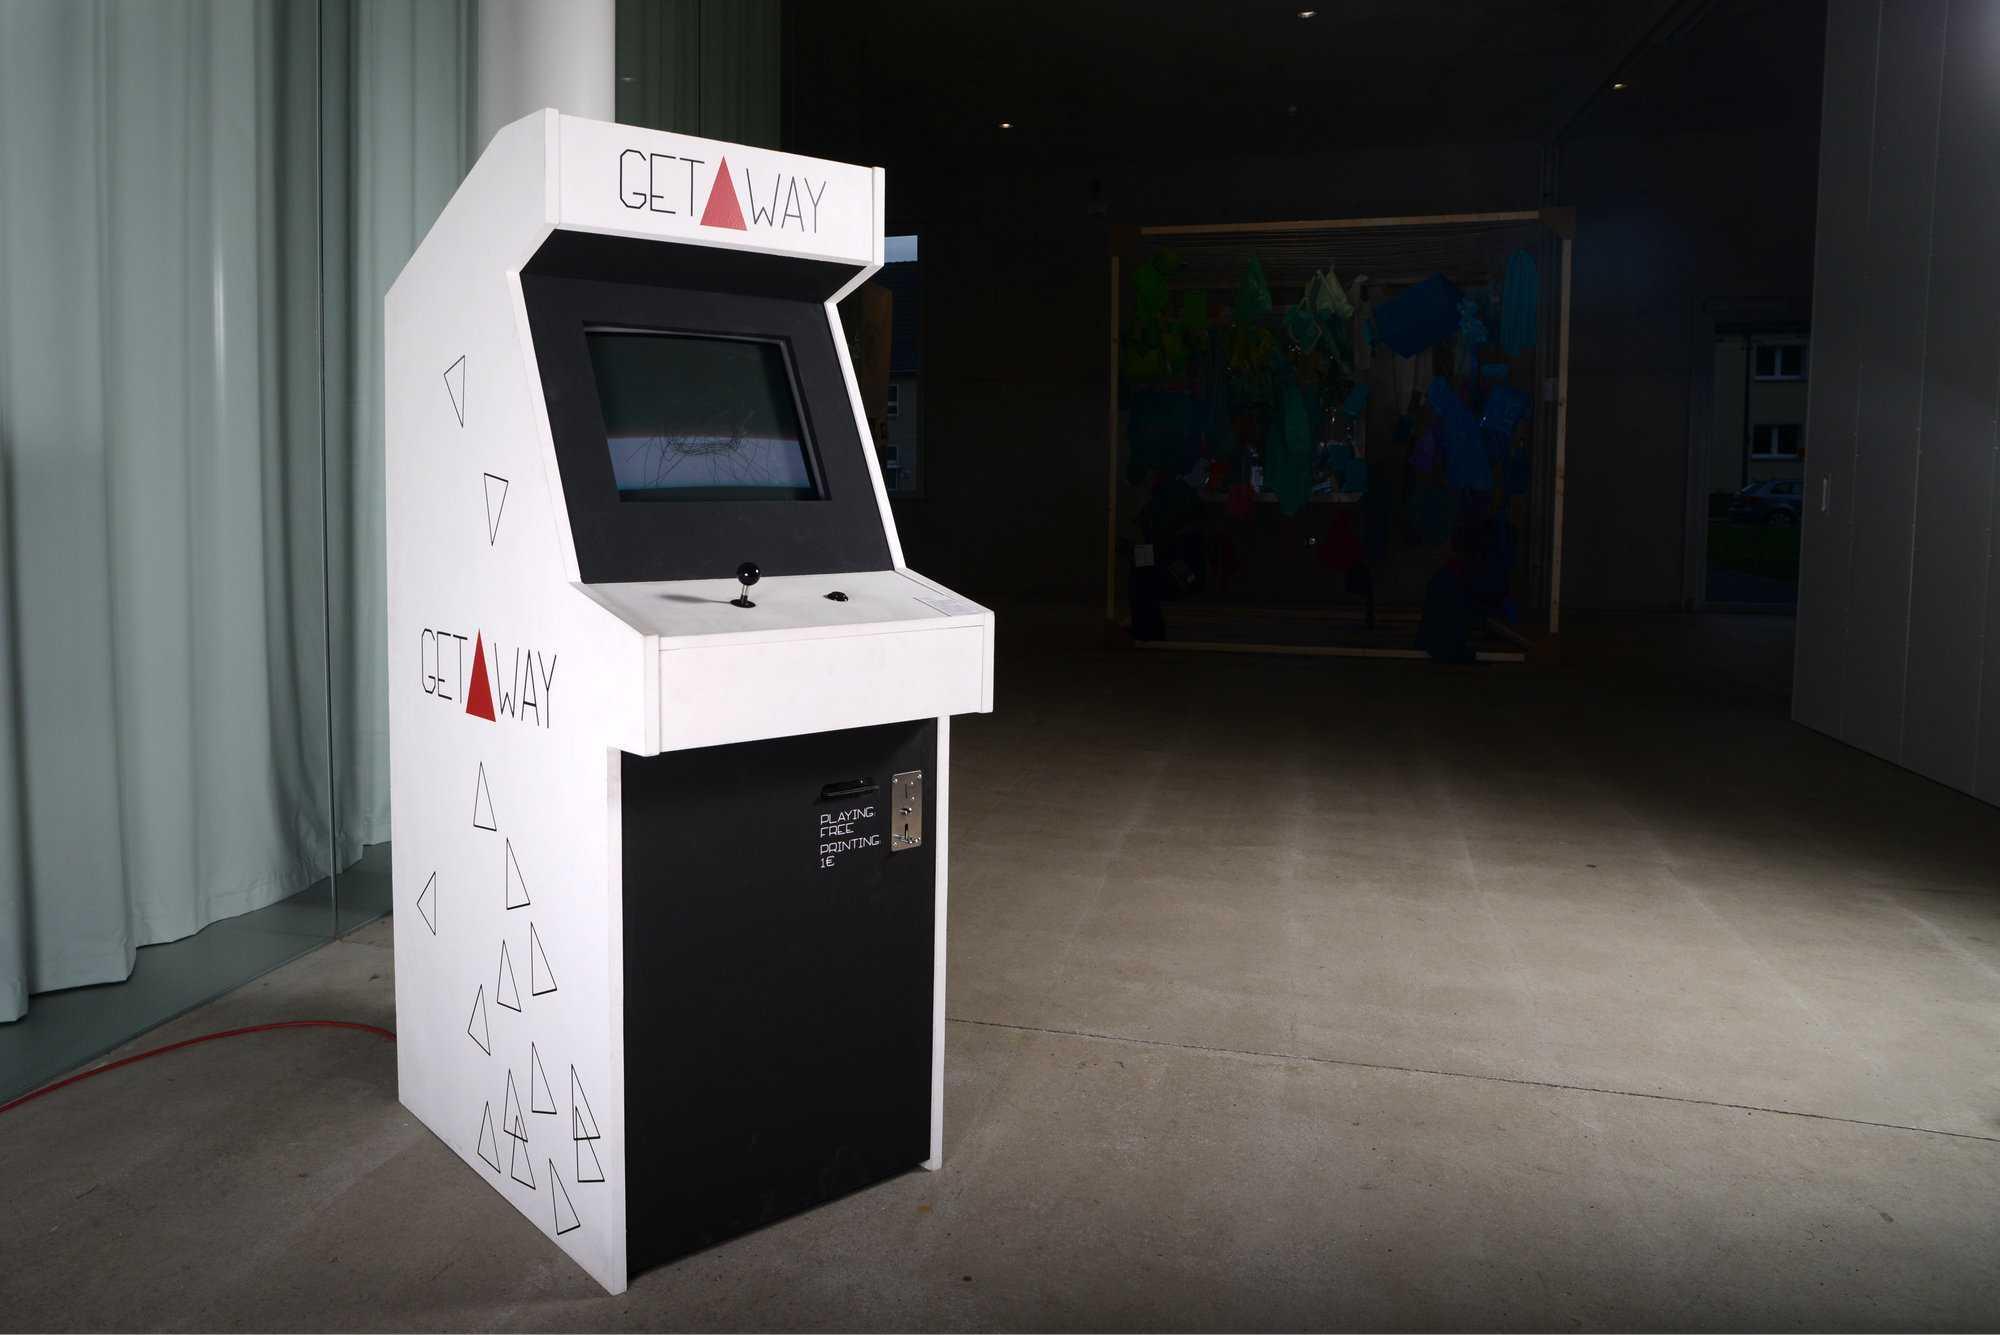 Der Spielautomat